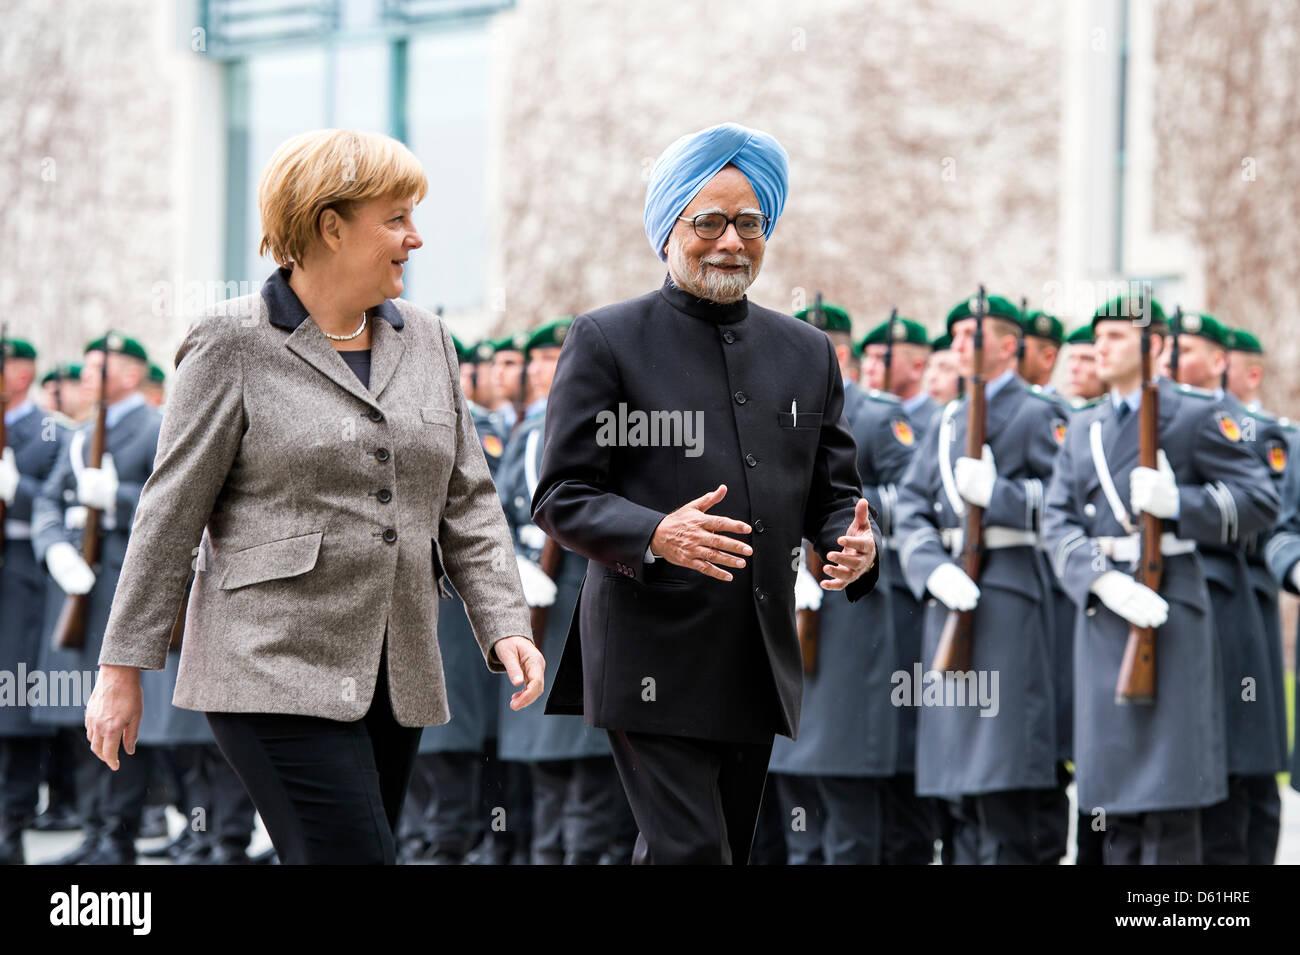 Berlin, Germany.11th April 2013.German Bundeskanzlerin Angela Merkel begrüßt die Premierminister von Indien, Manmohan Stockfoto